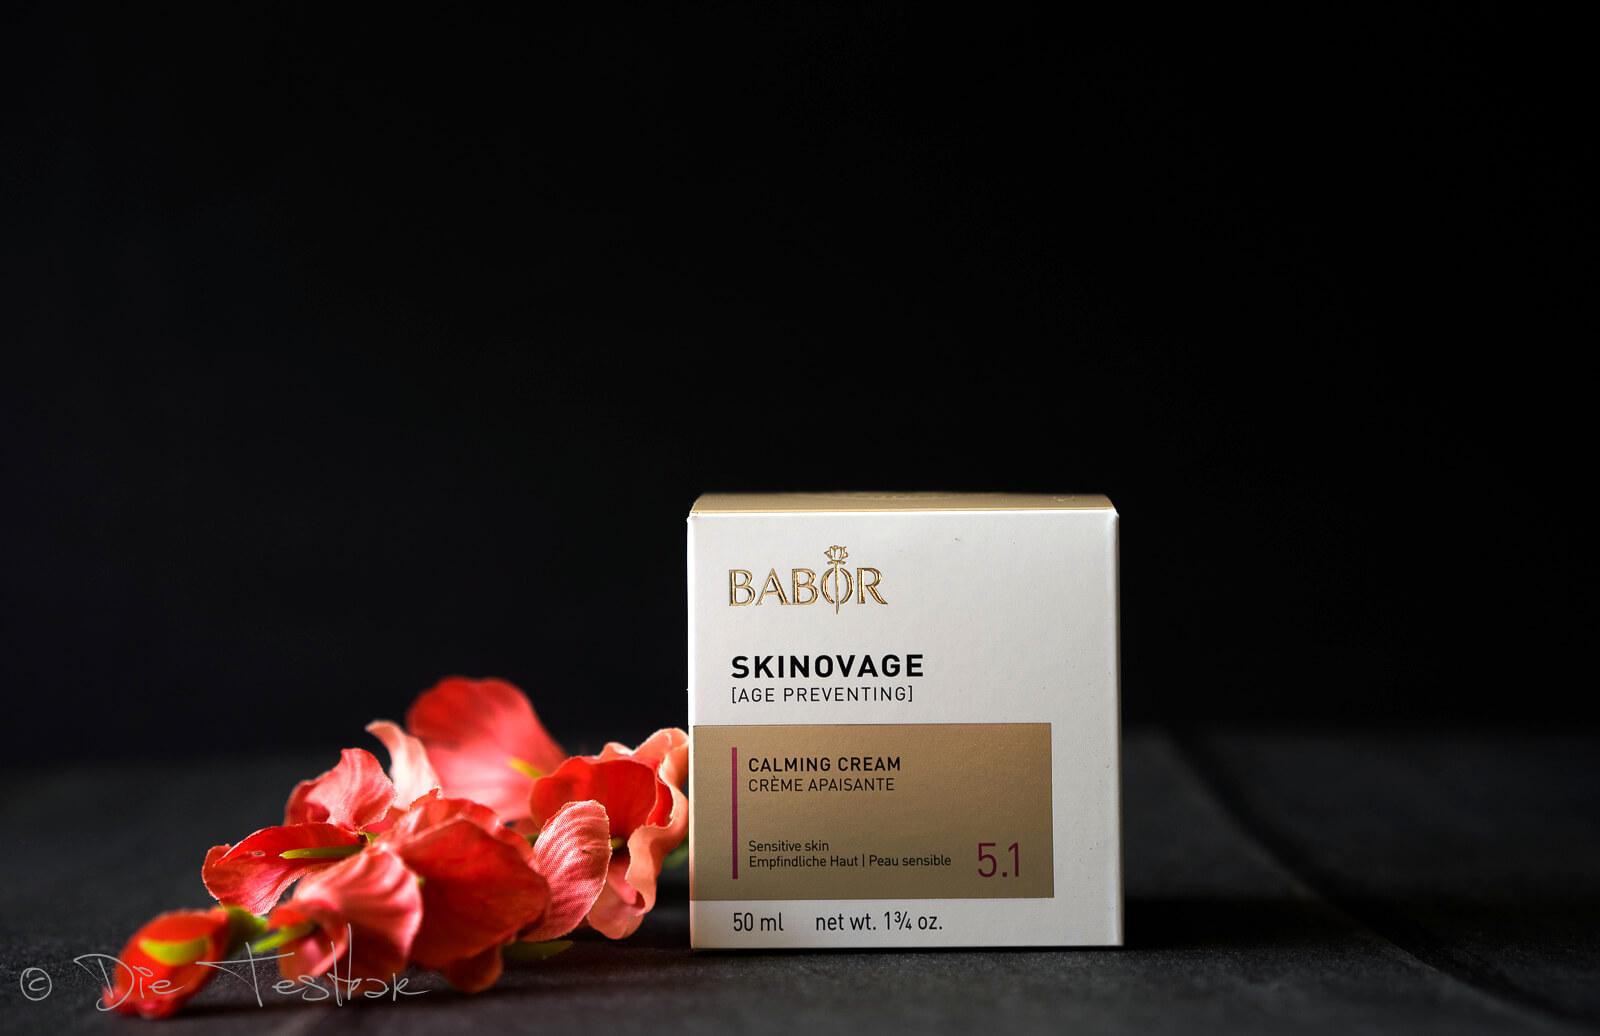 SKINOVAGE - MOISTURIZING Moisturizing Cream